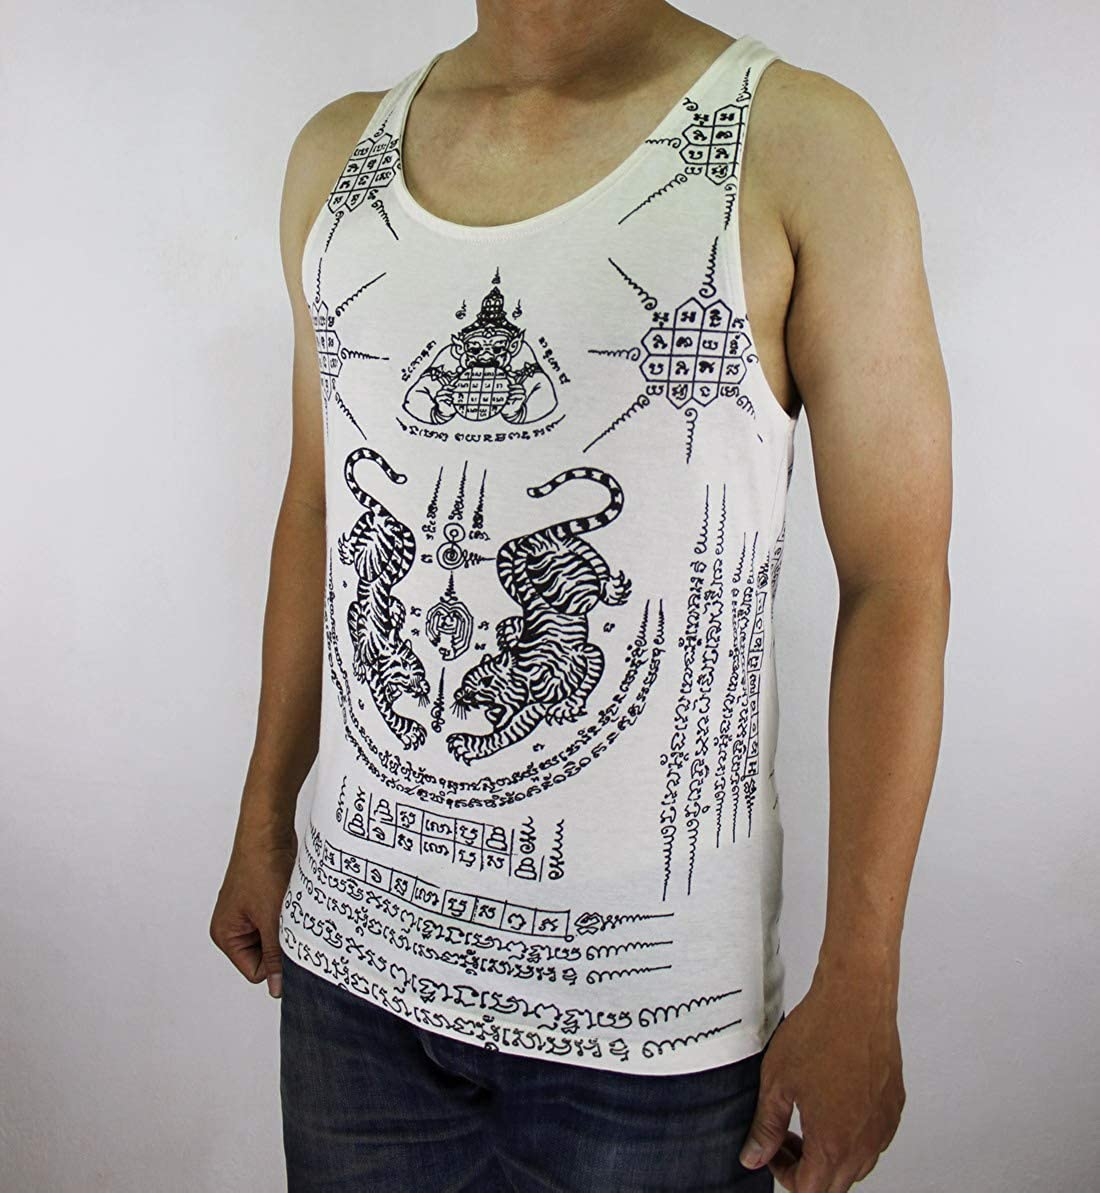 WORK Thai Tattoo Sak Yant tiger native Tank Top White WK-T06 size L